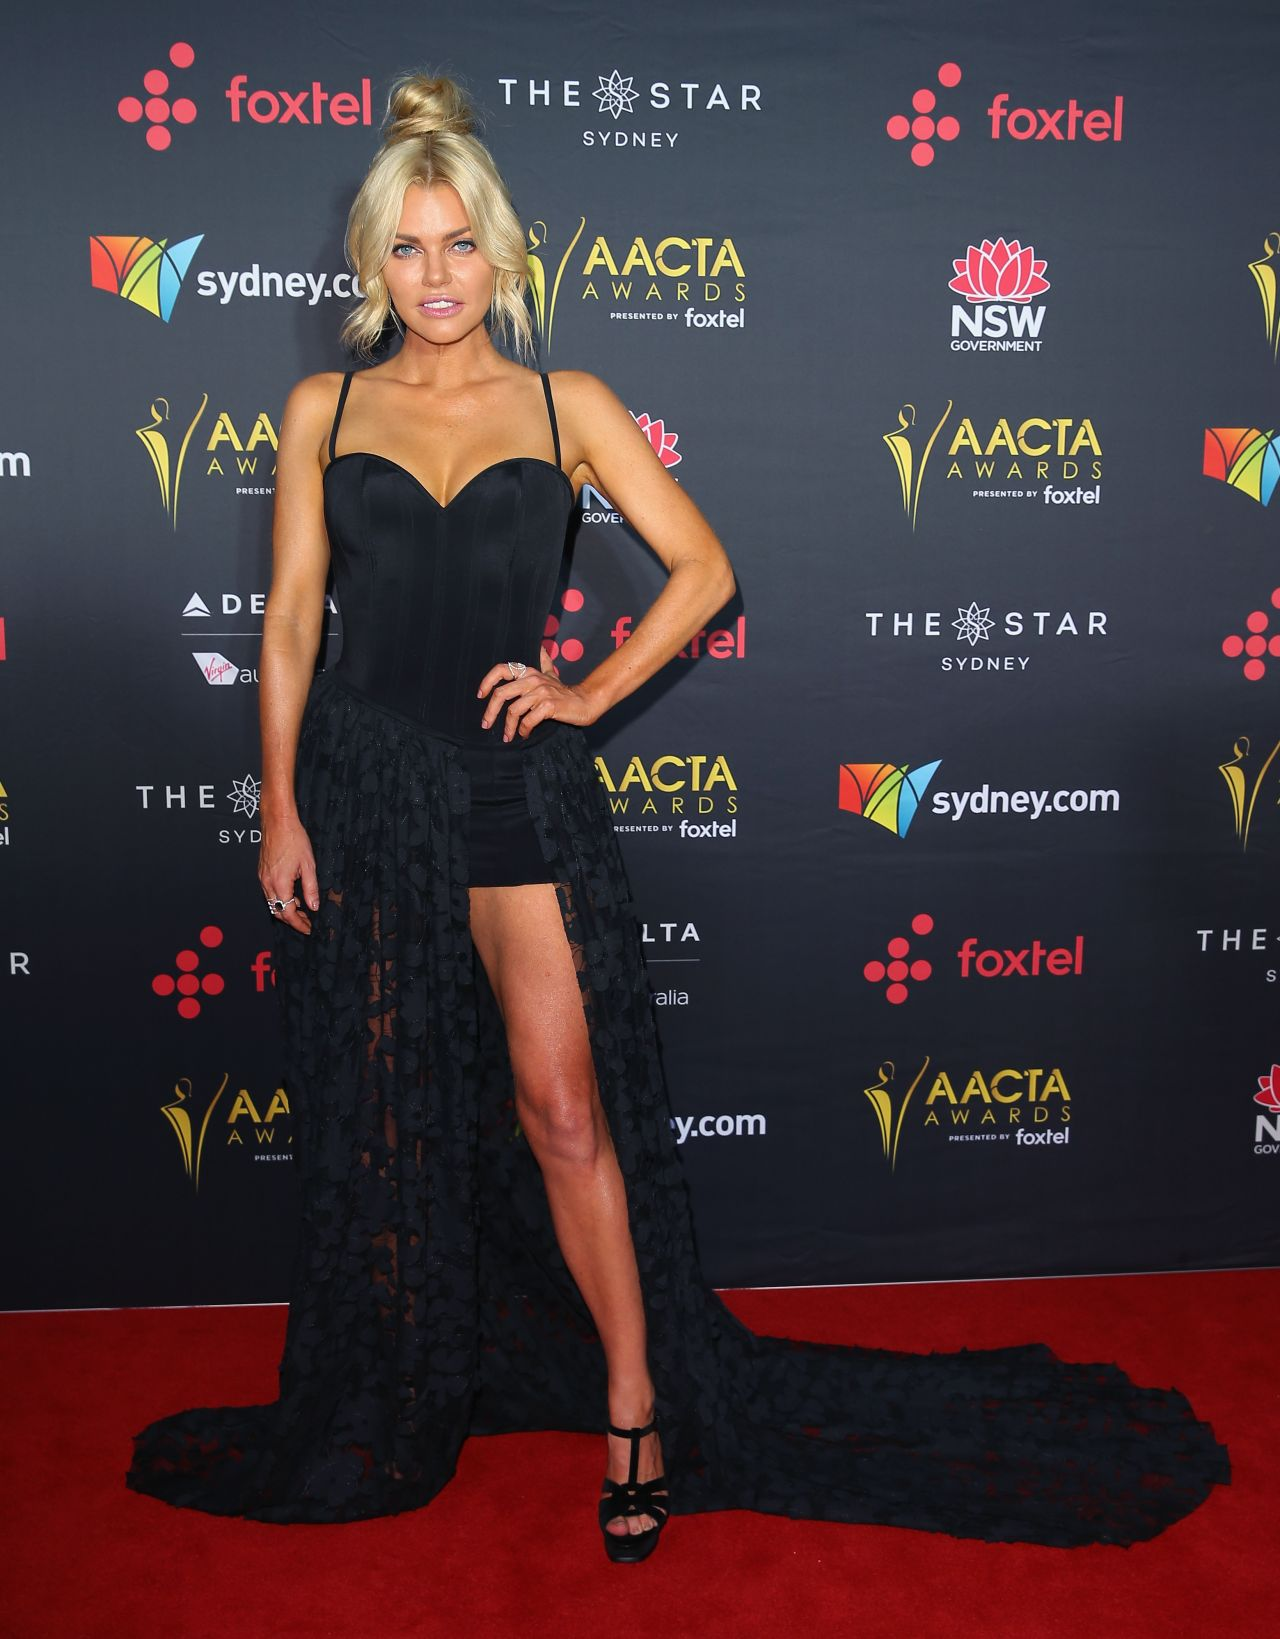 Sophie Monk – AACTA Awards 2017 Red Carpet in Sydney